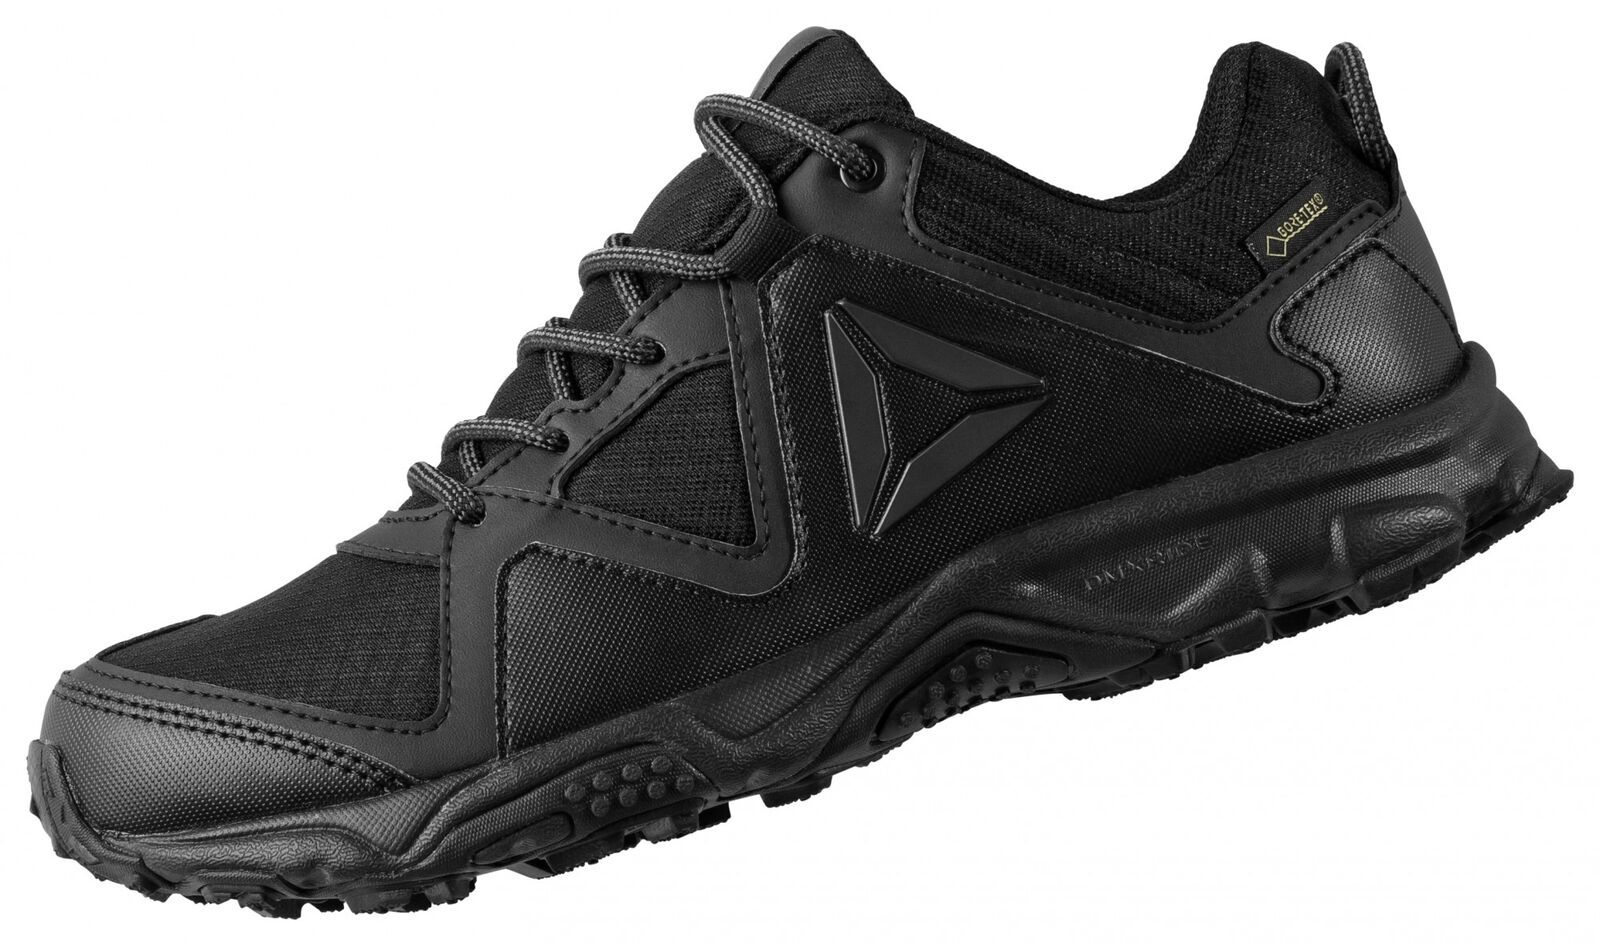 Reebok Franconia Ridge 3.0 GTX Ladies Outdoorschuh Trailschuh Walking shoes